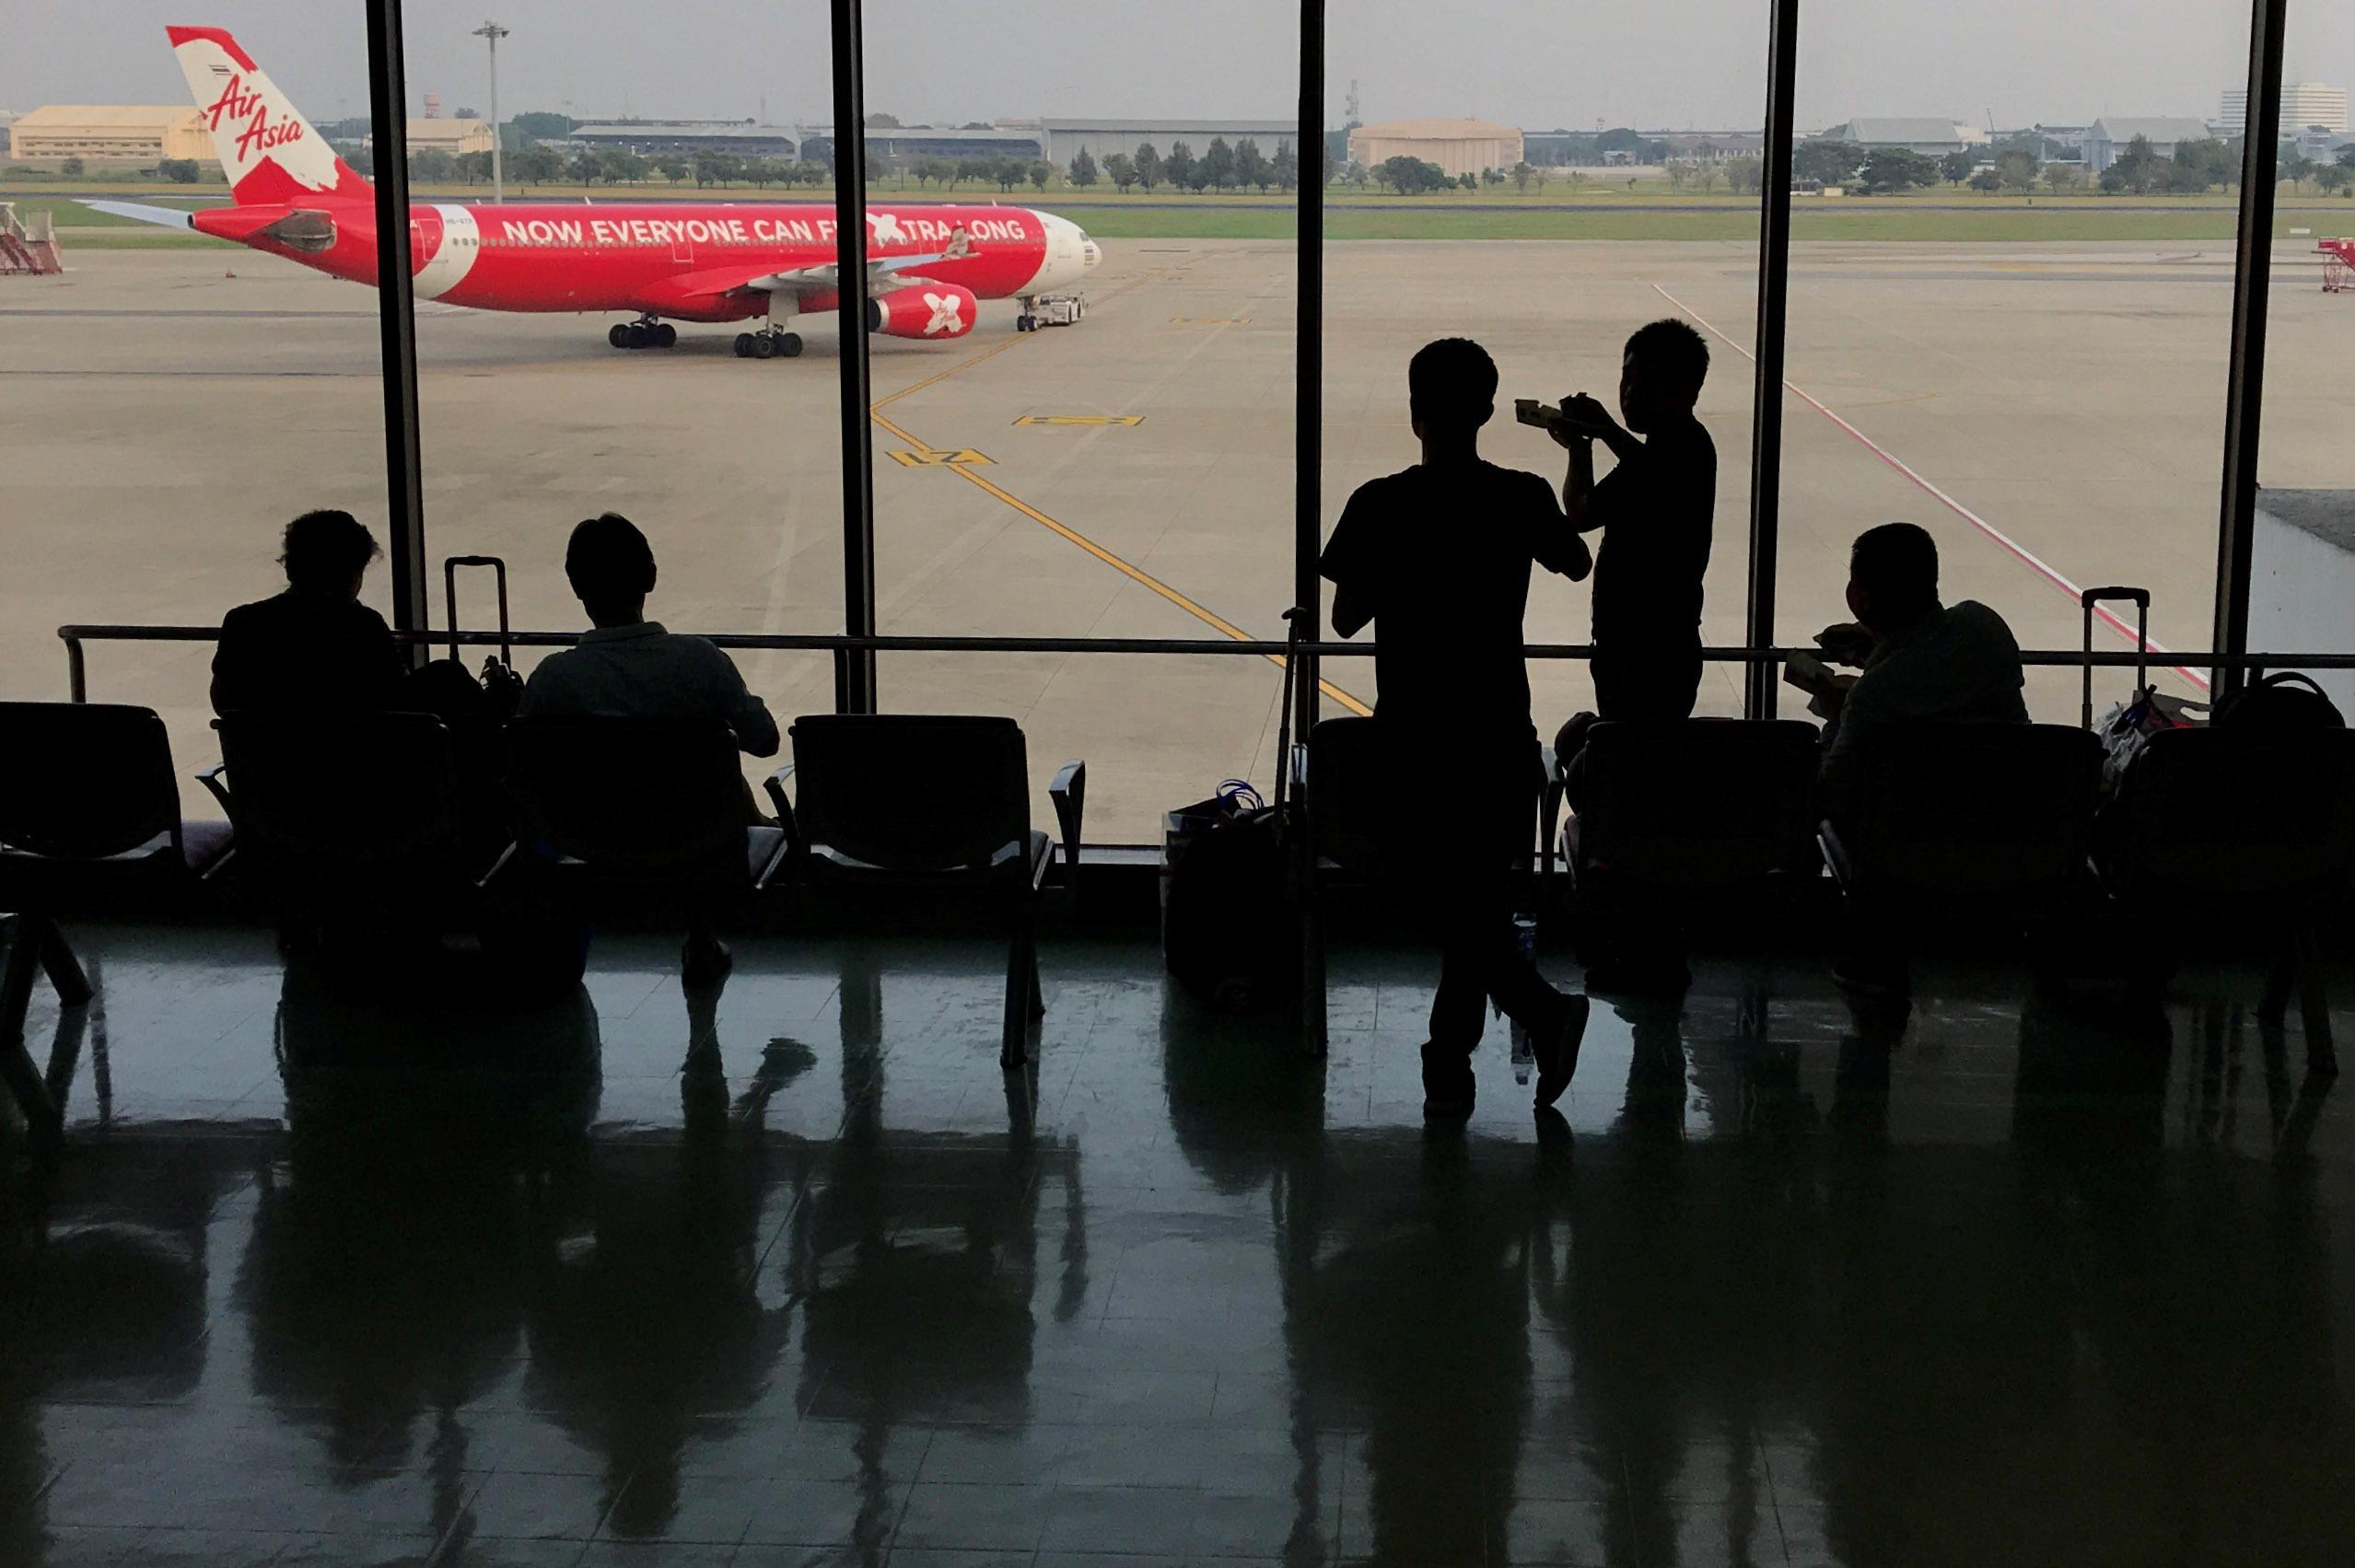 AirAsia transfers some Kuala Lumpur-Singapore slots to long-haul...